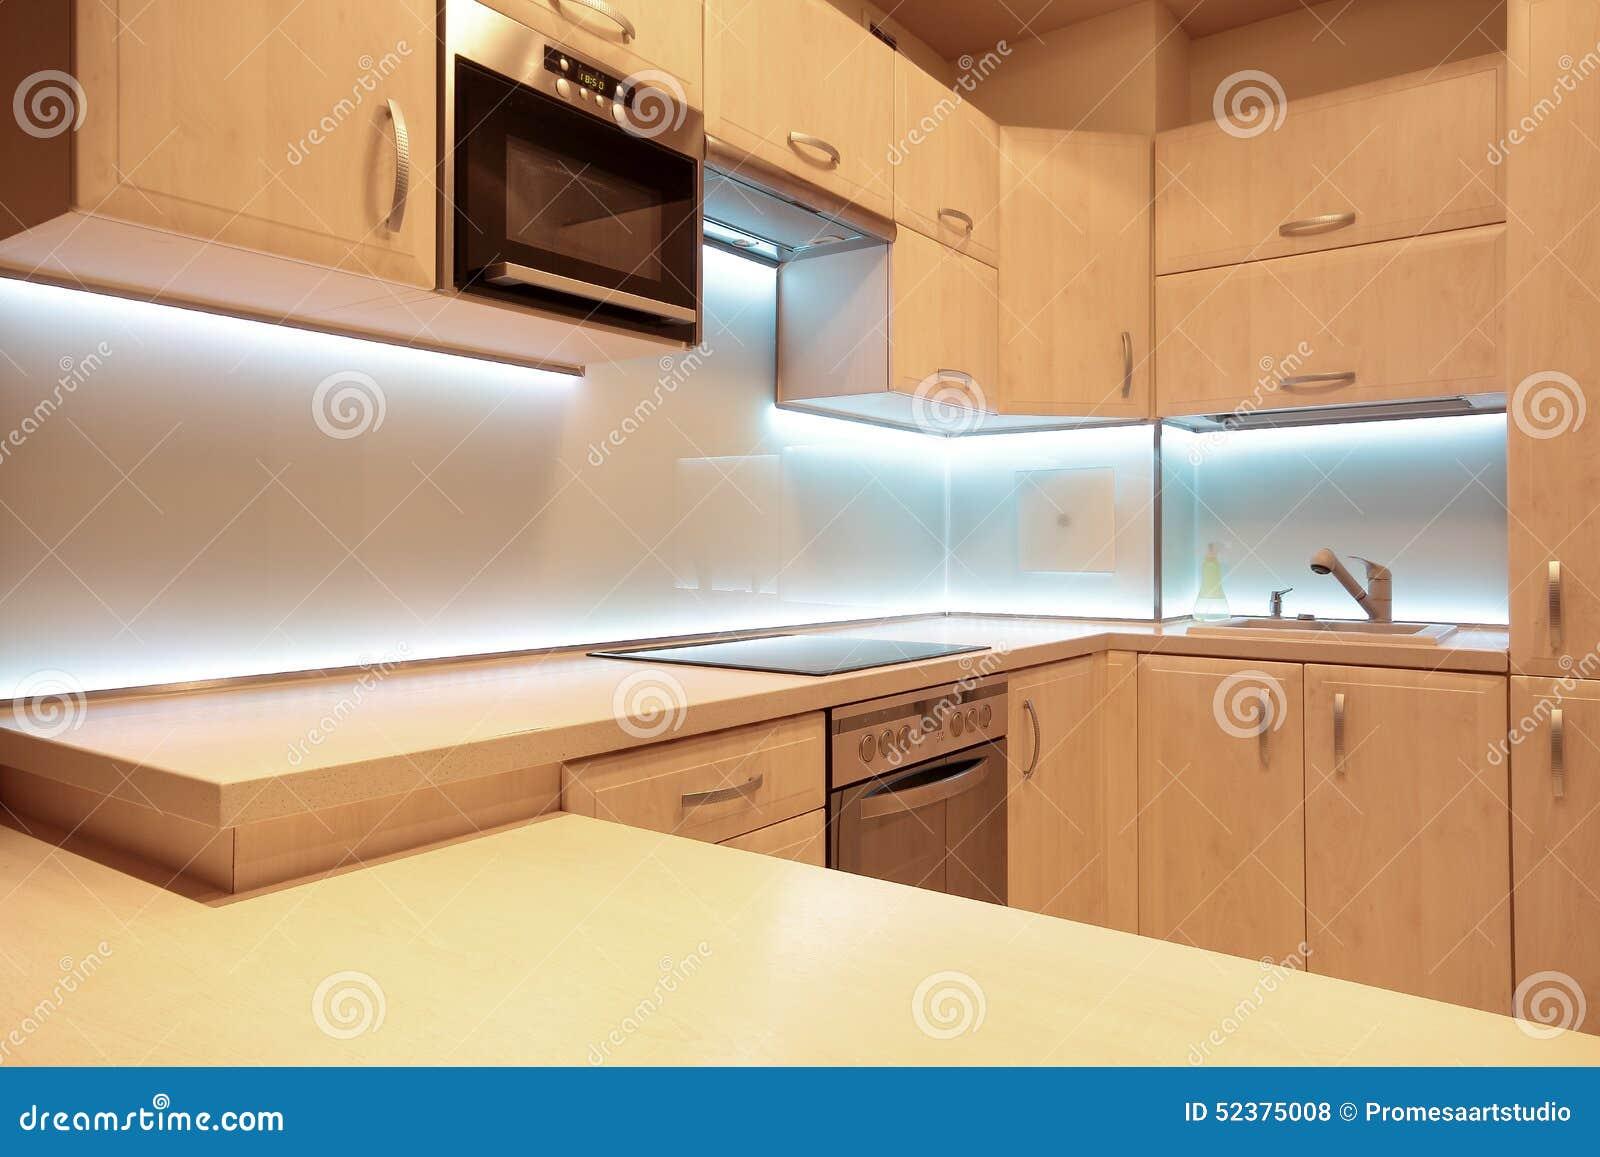 Stunning illuminazione a led cucina photos ideas - Illuminazione cucina moderna ...